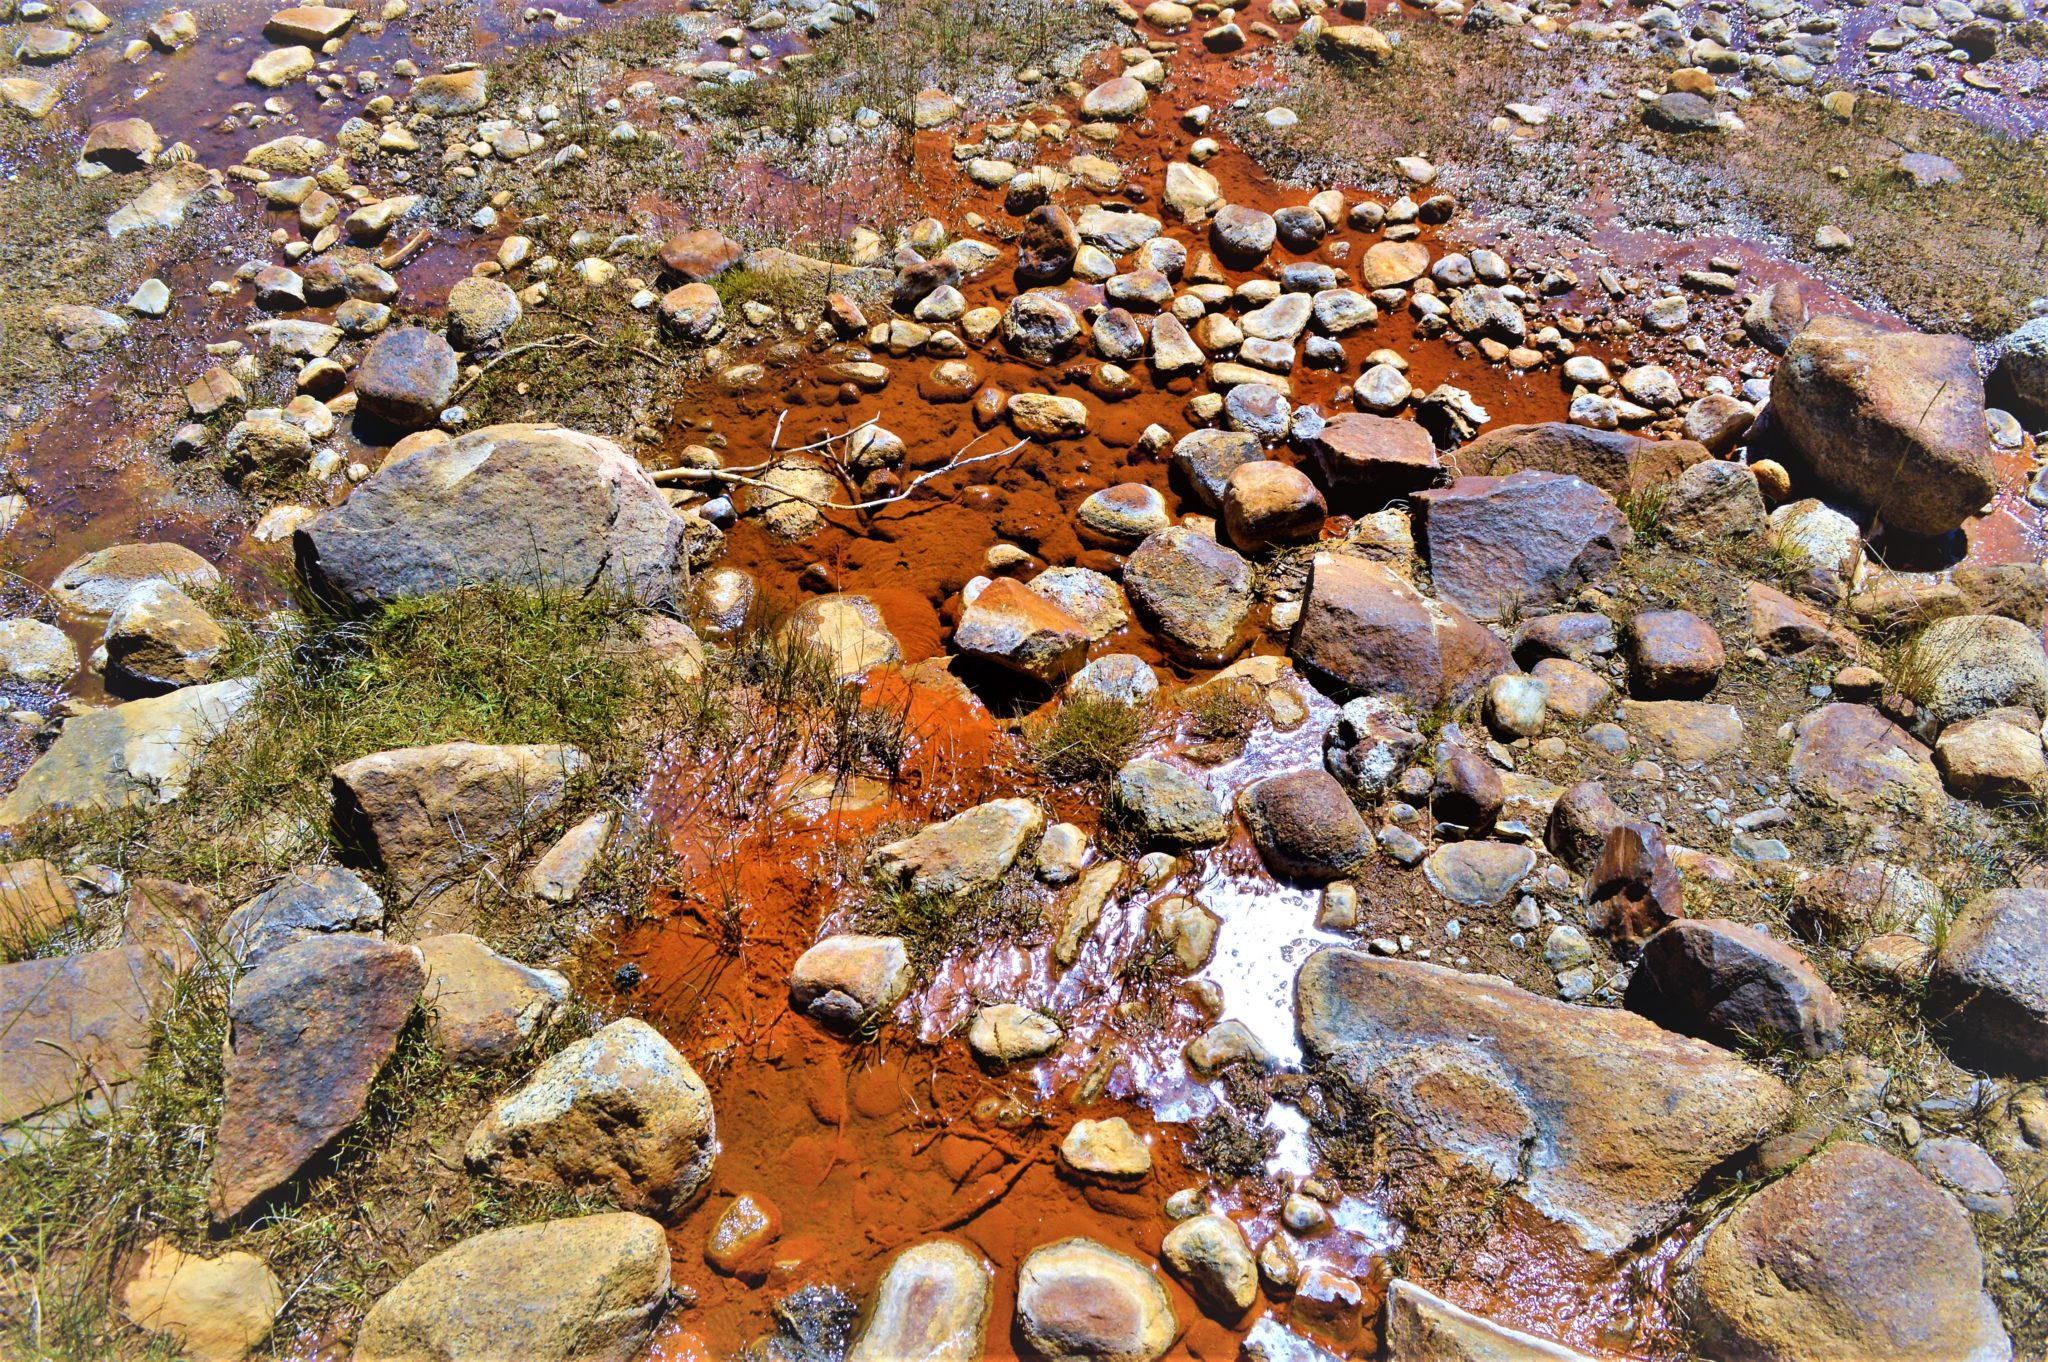 Water by soda springs, Yosemite National park, things to do at yosemite, California